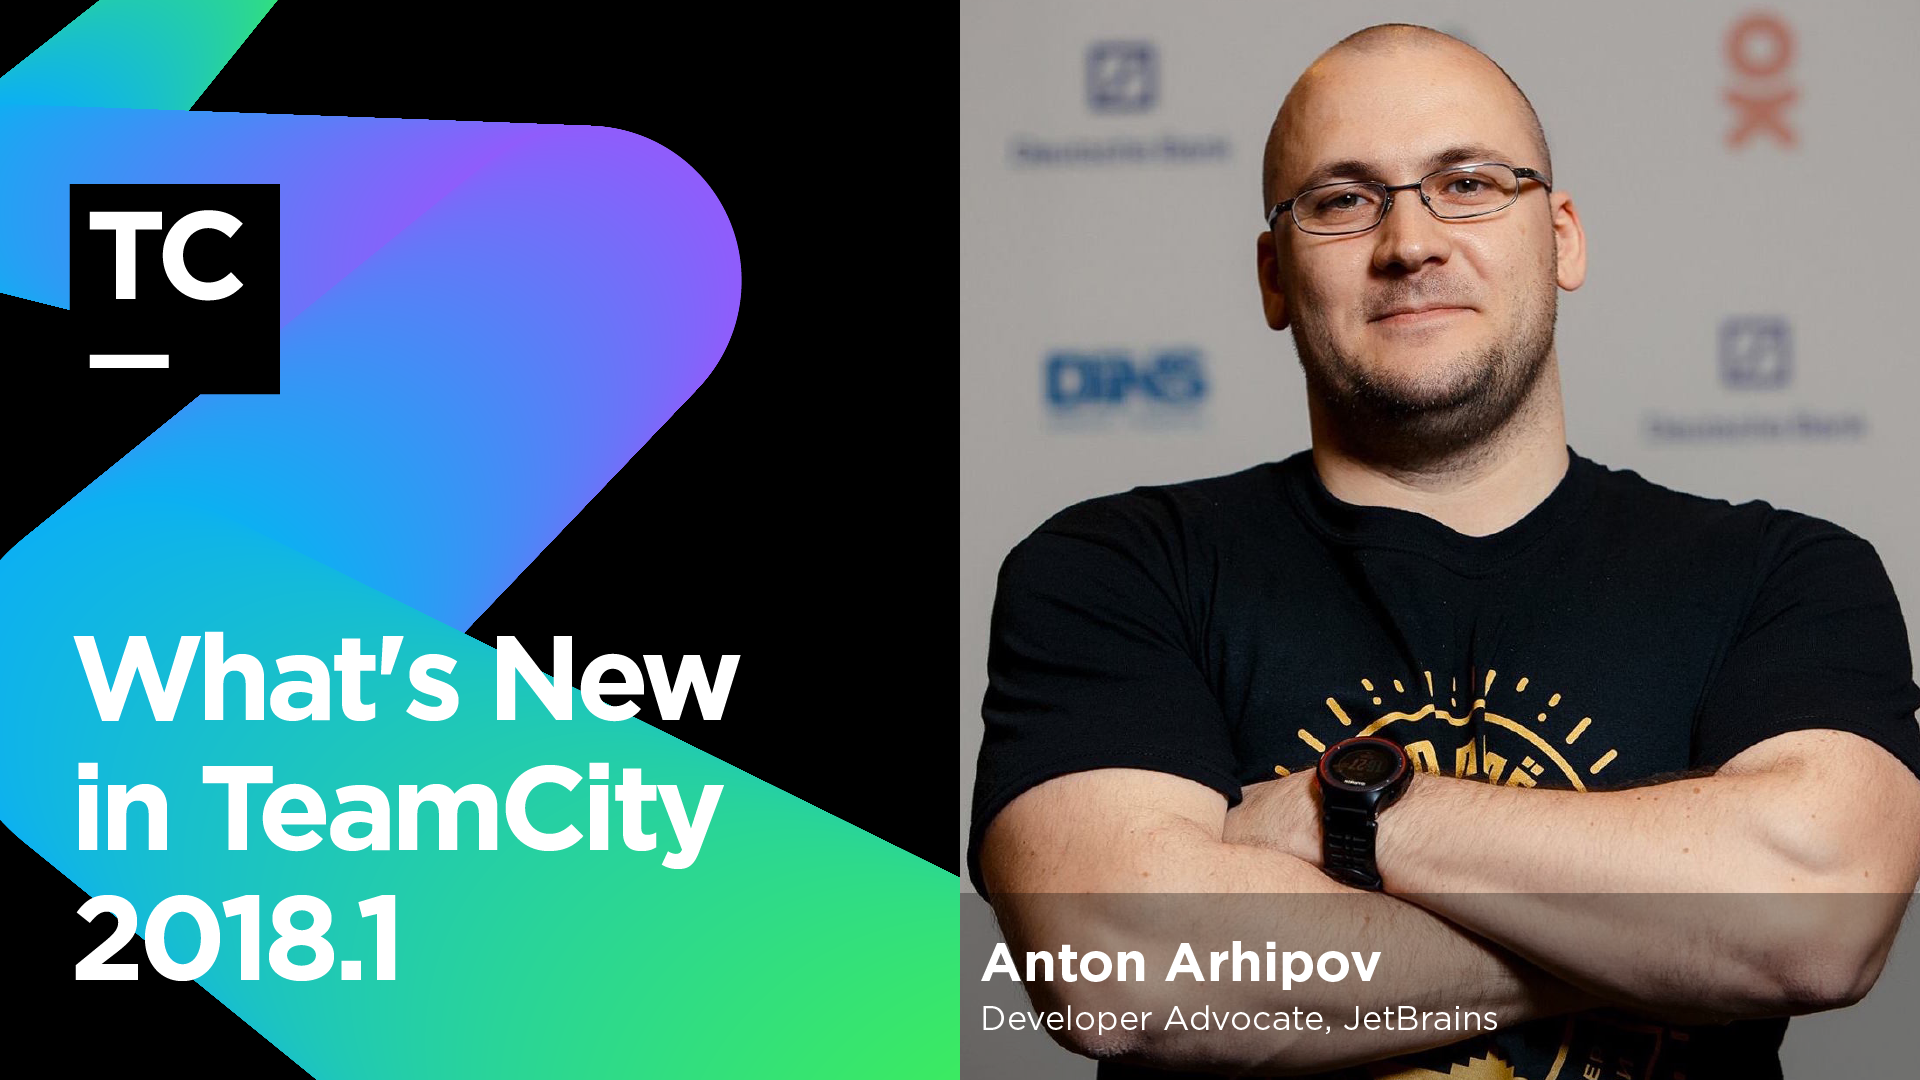 teamcity_webinar_What_s_New_in_TeamCity_2018_1